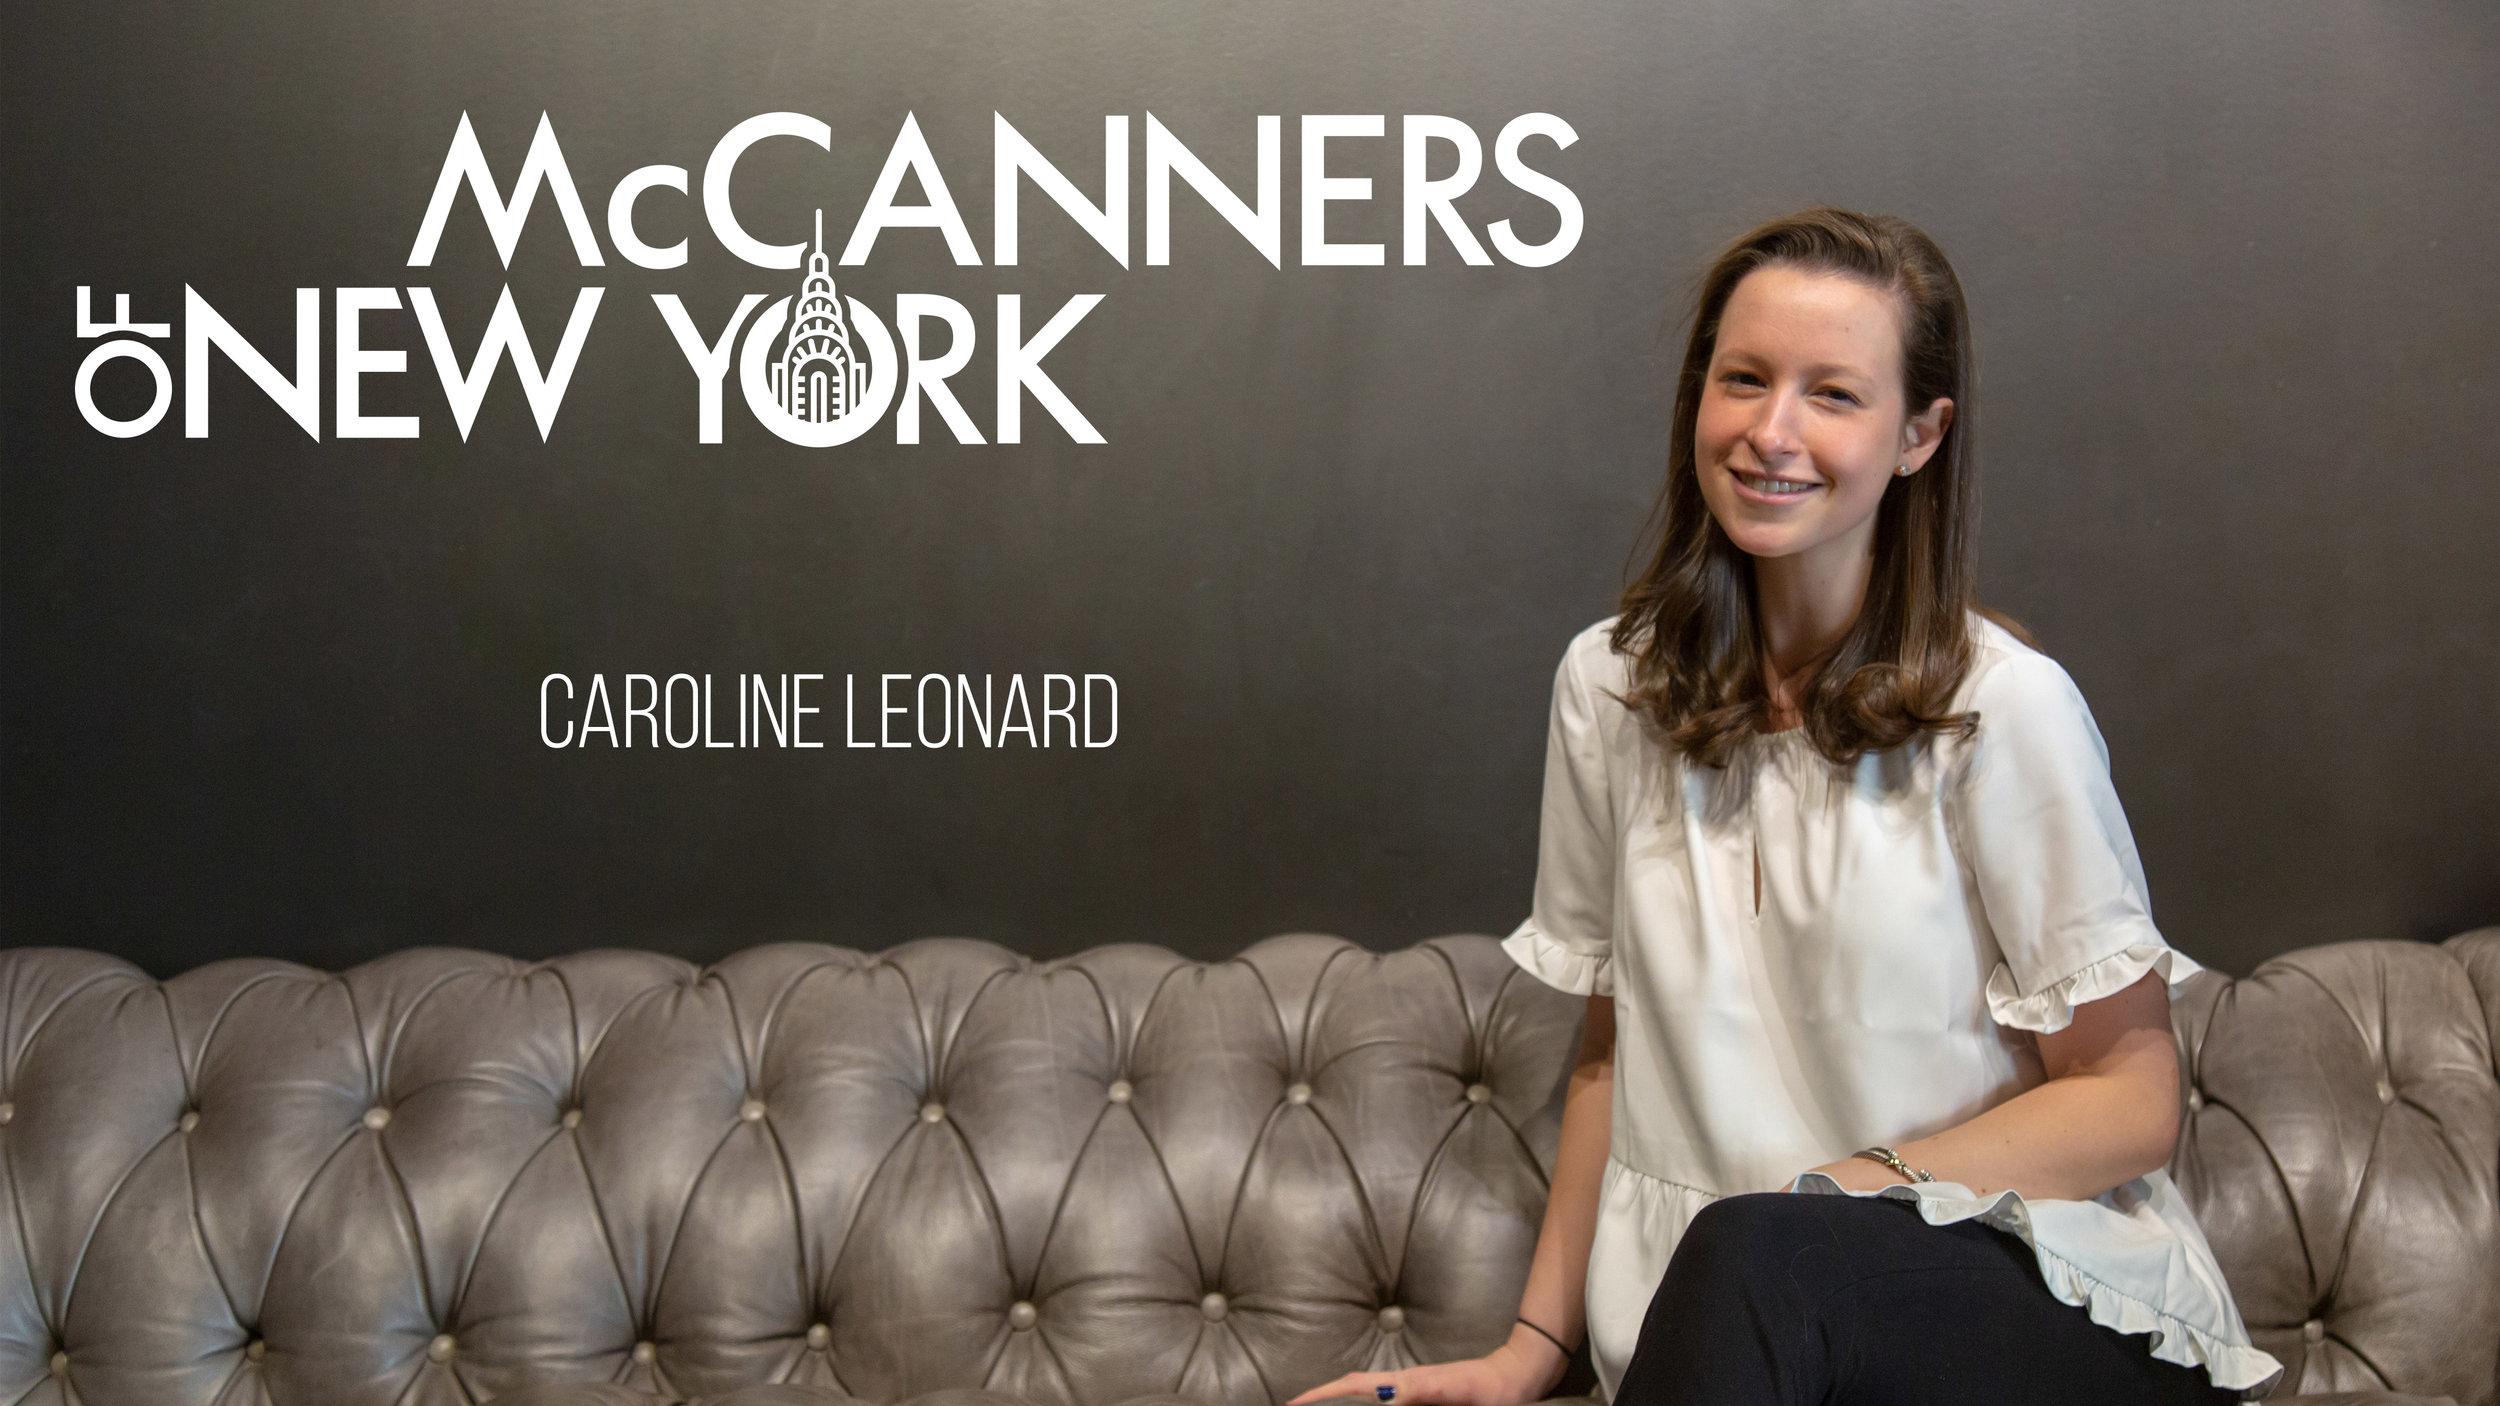 CarolineLeonard.jpg